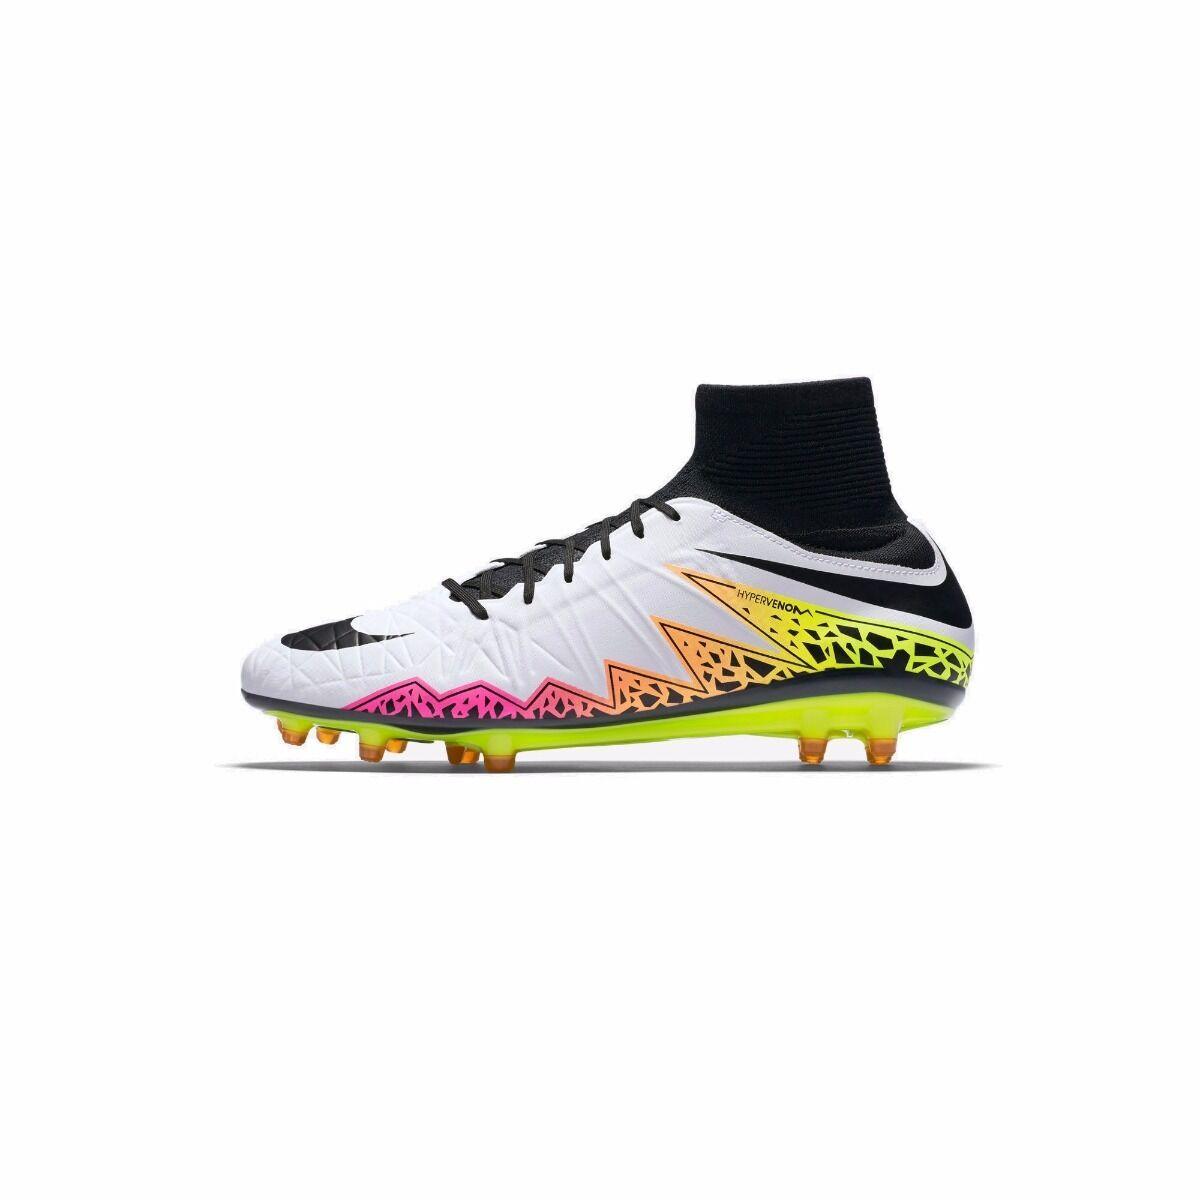 Nike df hypervenom phatal ii df Nike fg herren stiefel wei ß ß - ball - orange schwarz neu e68897